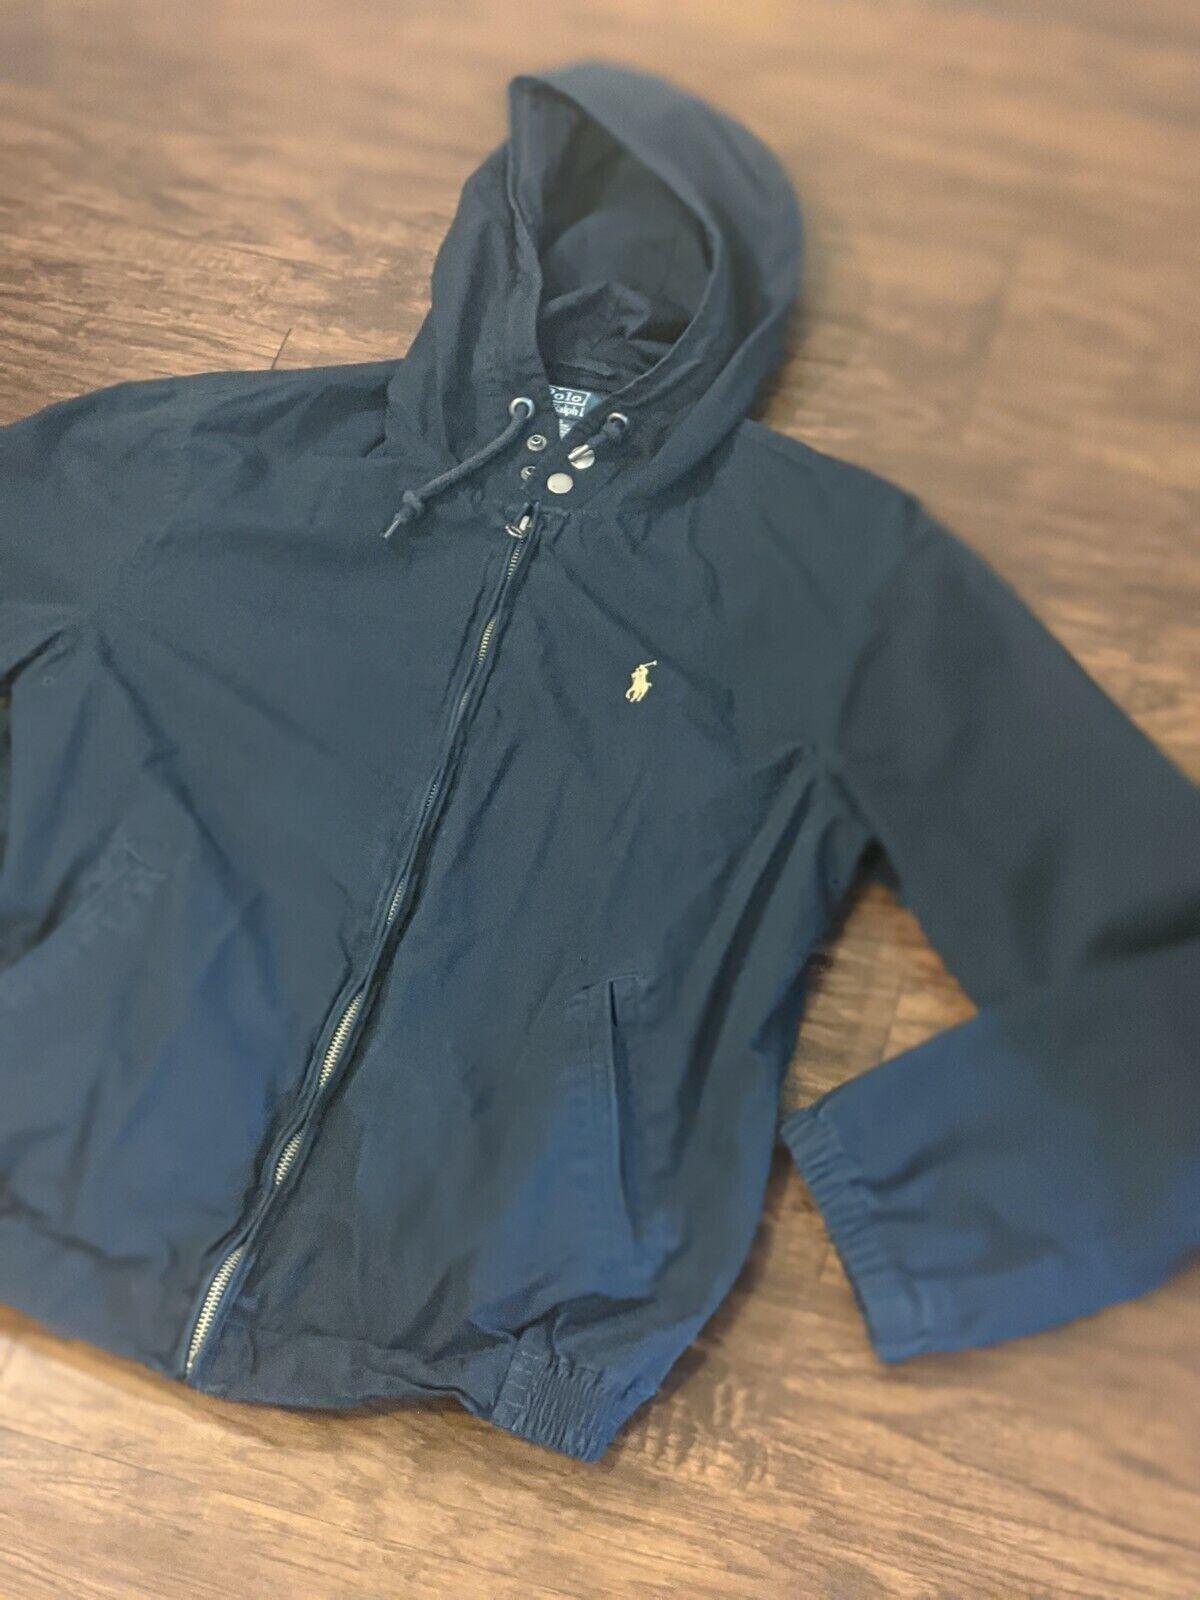 Polo Ralph Lauren Jacket 1980s Vintage Talon Zipp… - image 3